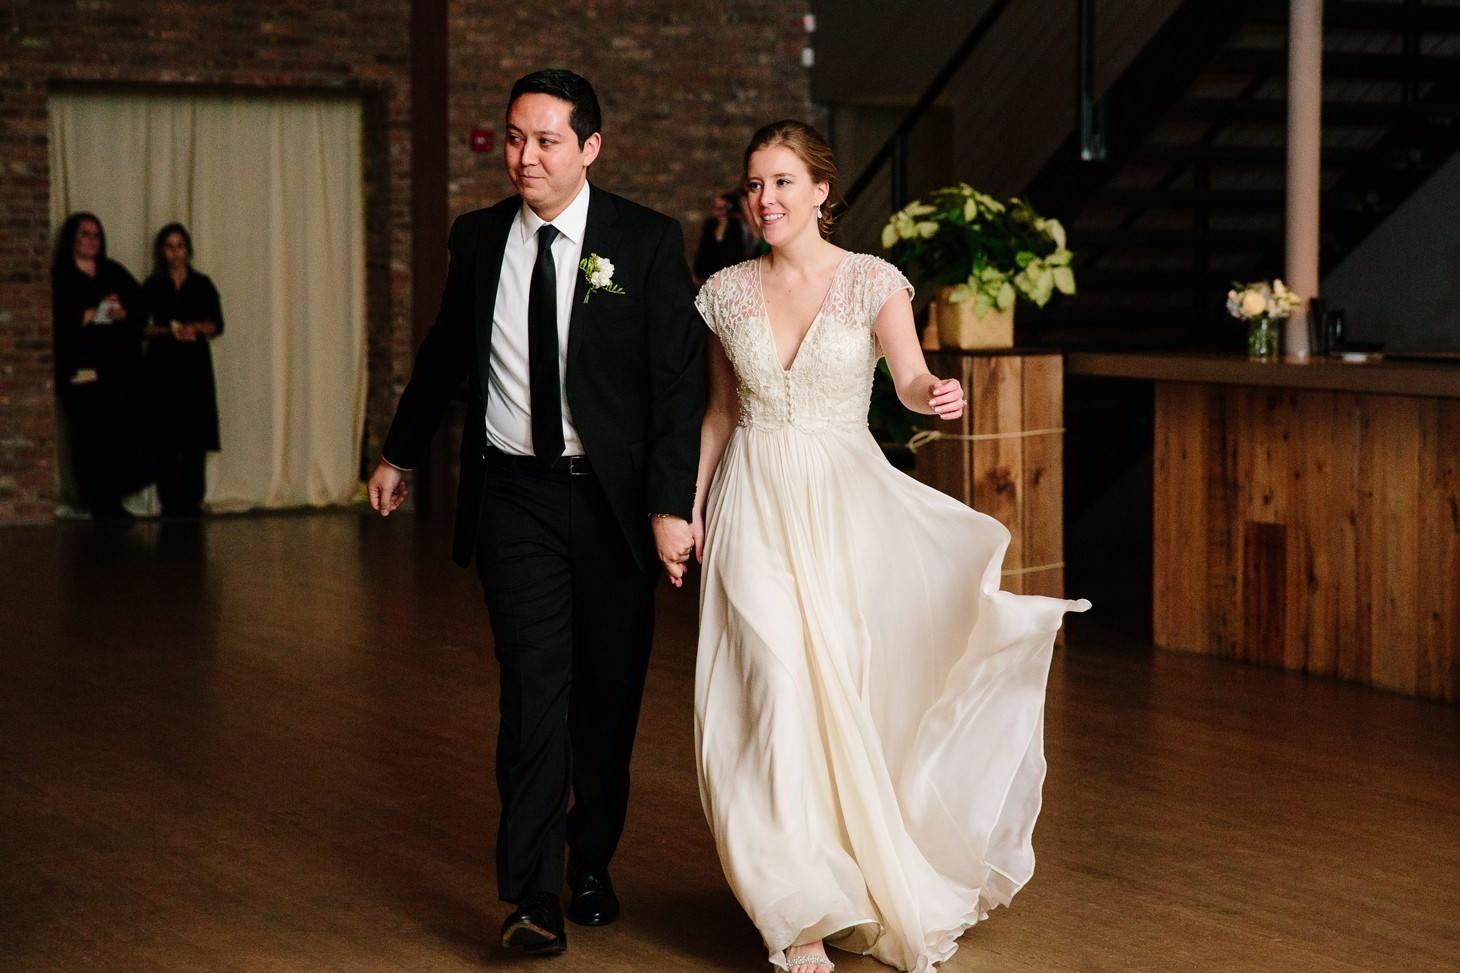 023-nyc-wedding-photographer-beacon-roundhouse-.jpg